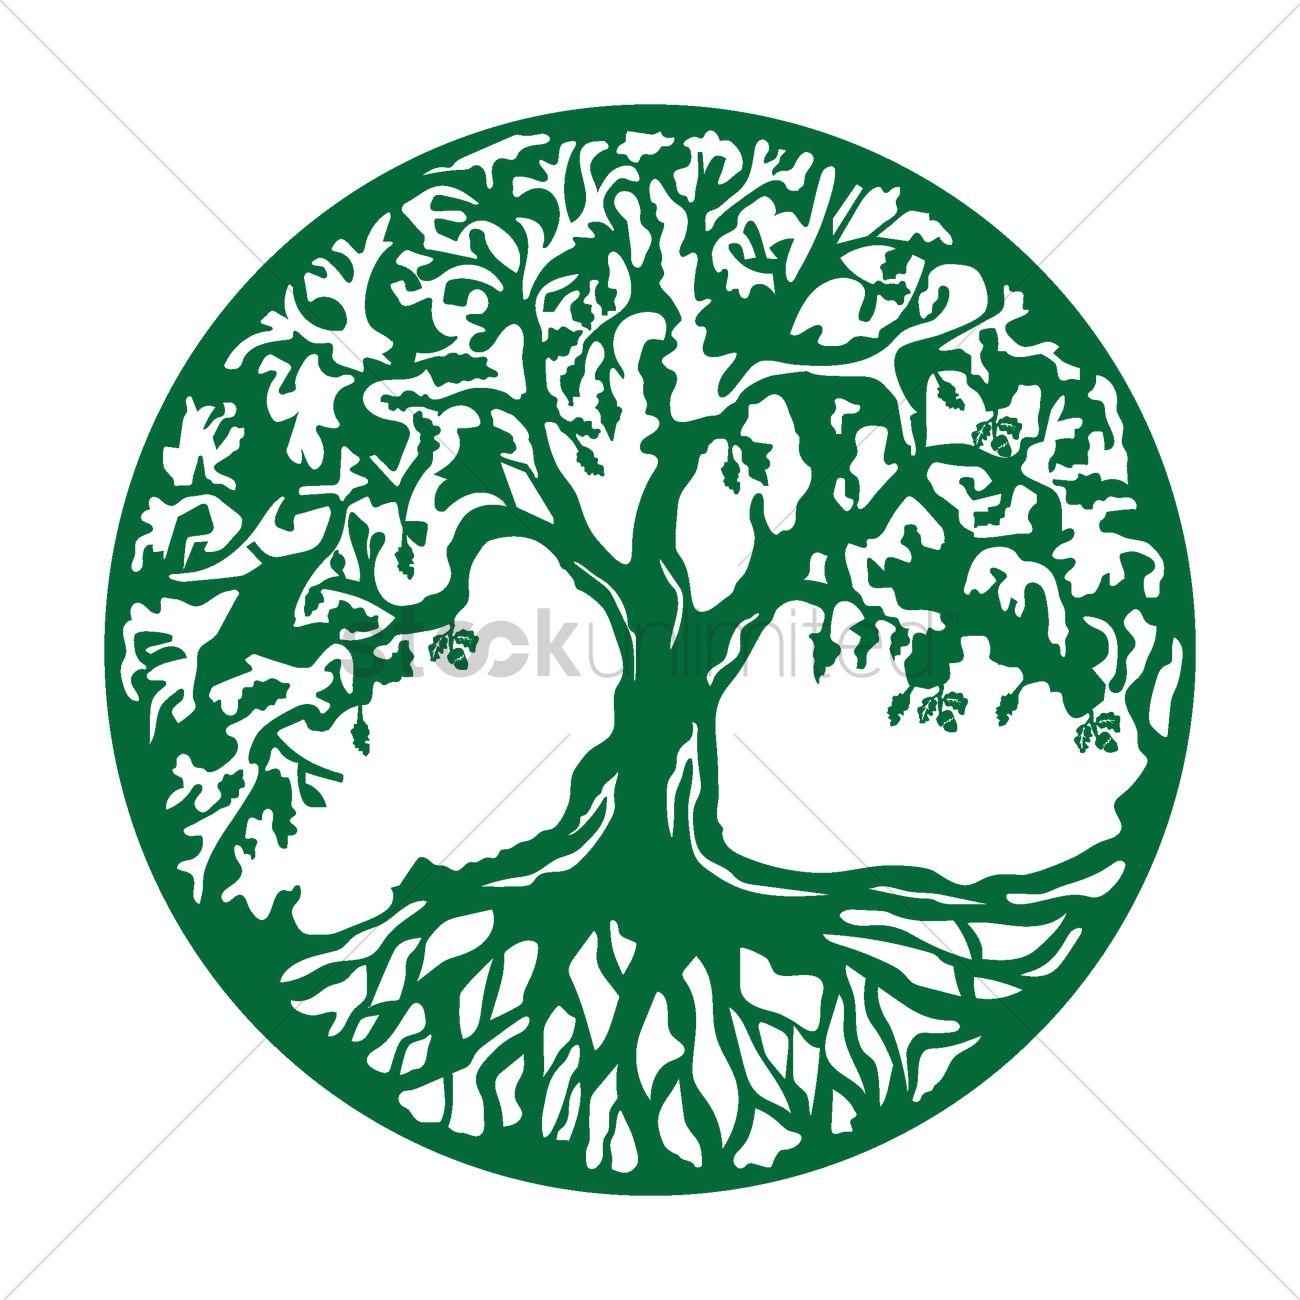 oak tree icon vector image 1515594 stockunlimited antarctic clipart clipart antarctica